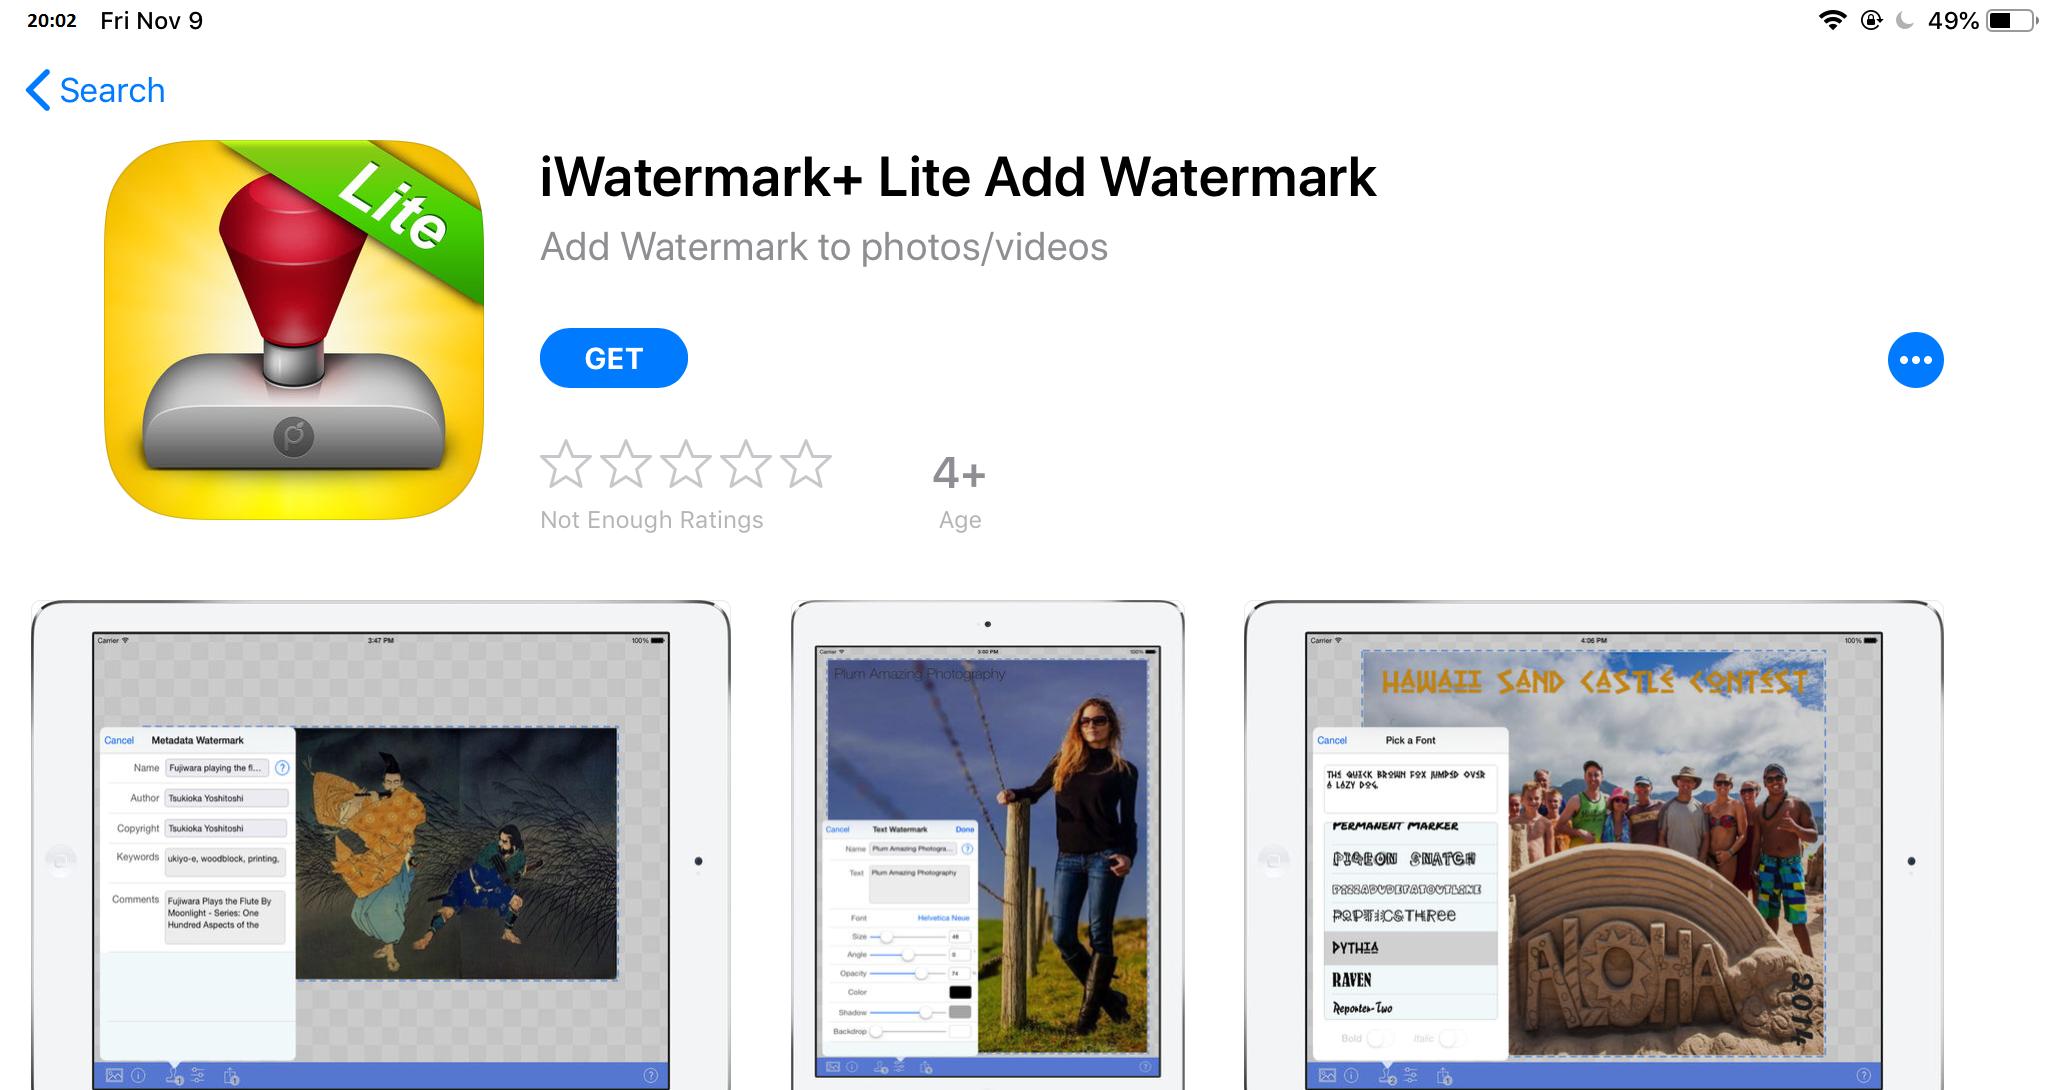 iWatermark+